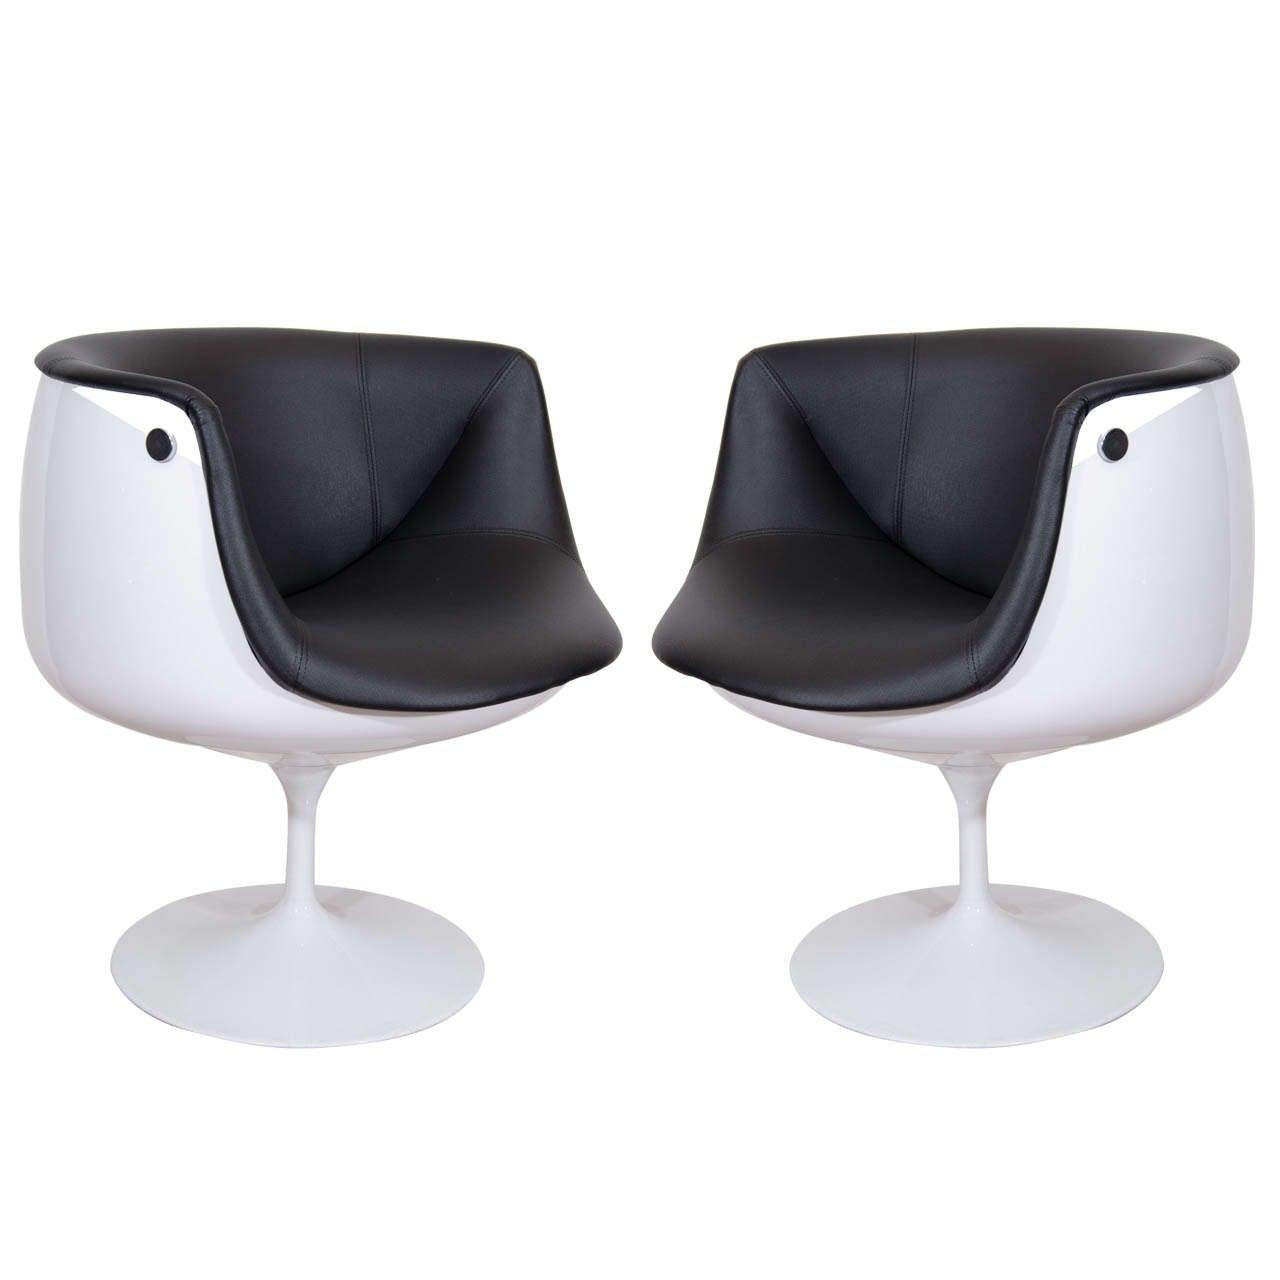 mid century egg chair office depot hardwood floor mat a pair of half tulip swivel chairs at 1stdibs